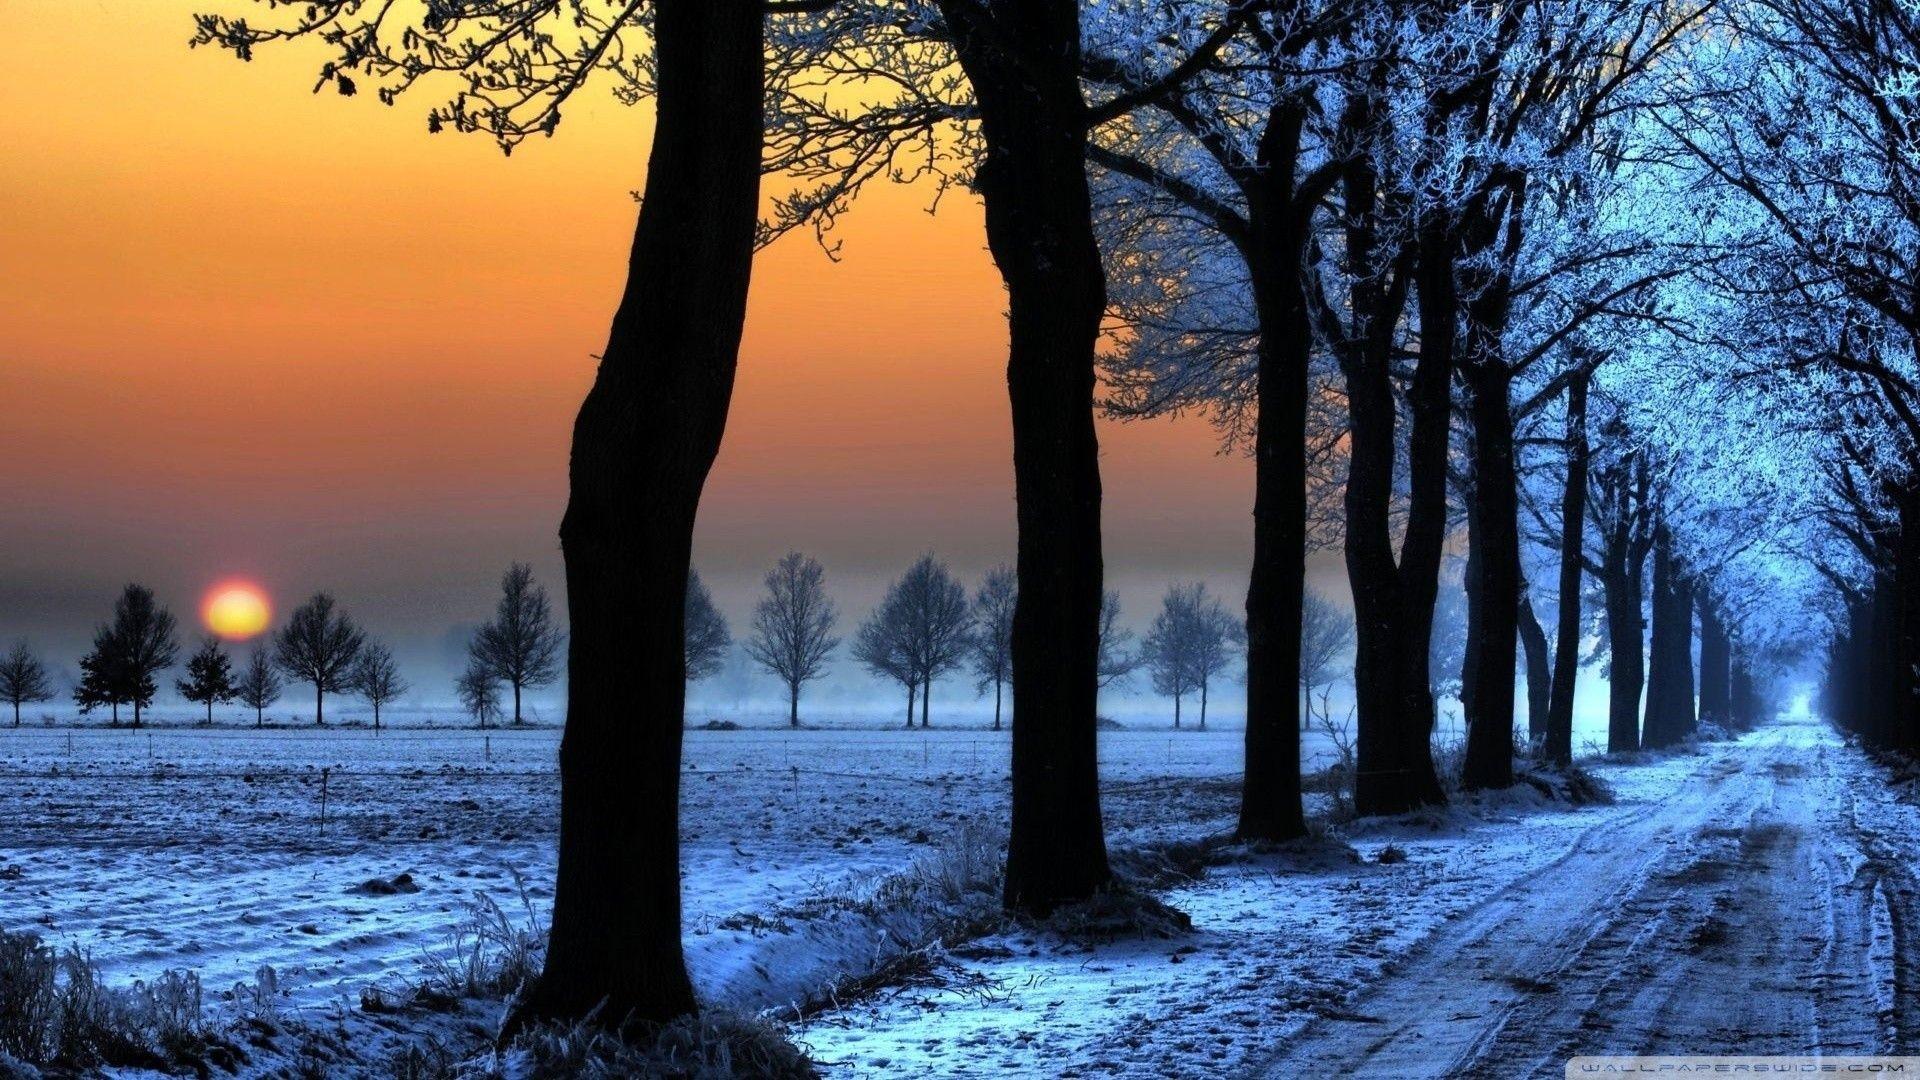 40+ Beautiful Nature Wallpapers | Wallpapers | Pinterest | Nature wallpaper,  Beautiful nature wallpaper and Wallpaper